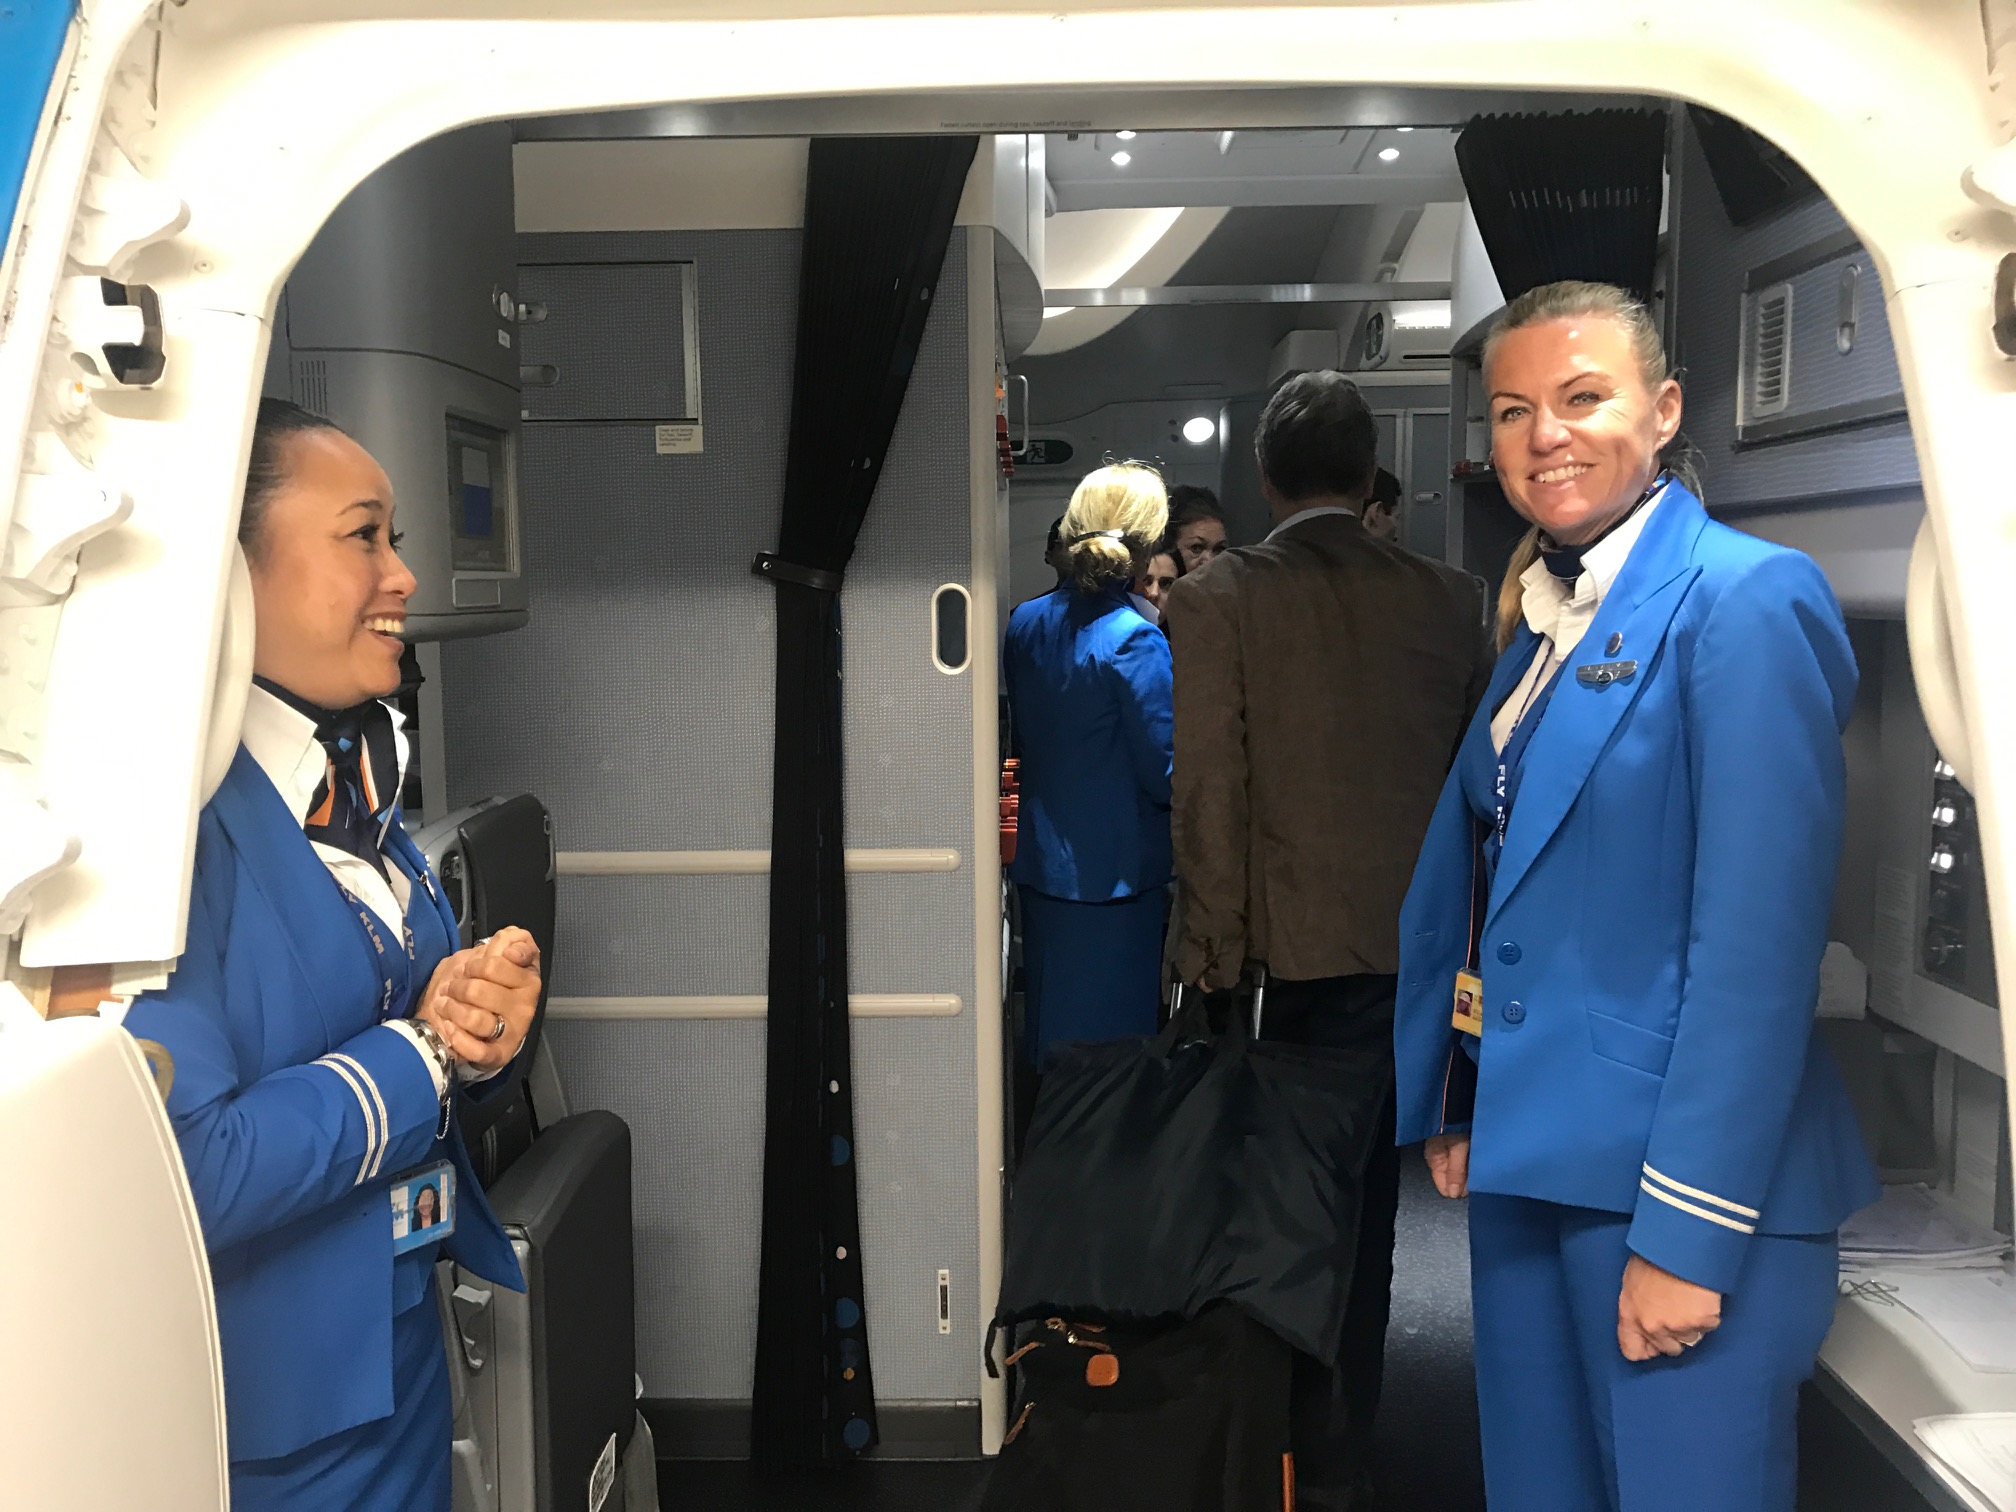 KLM service